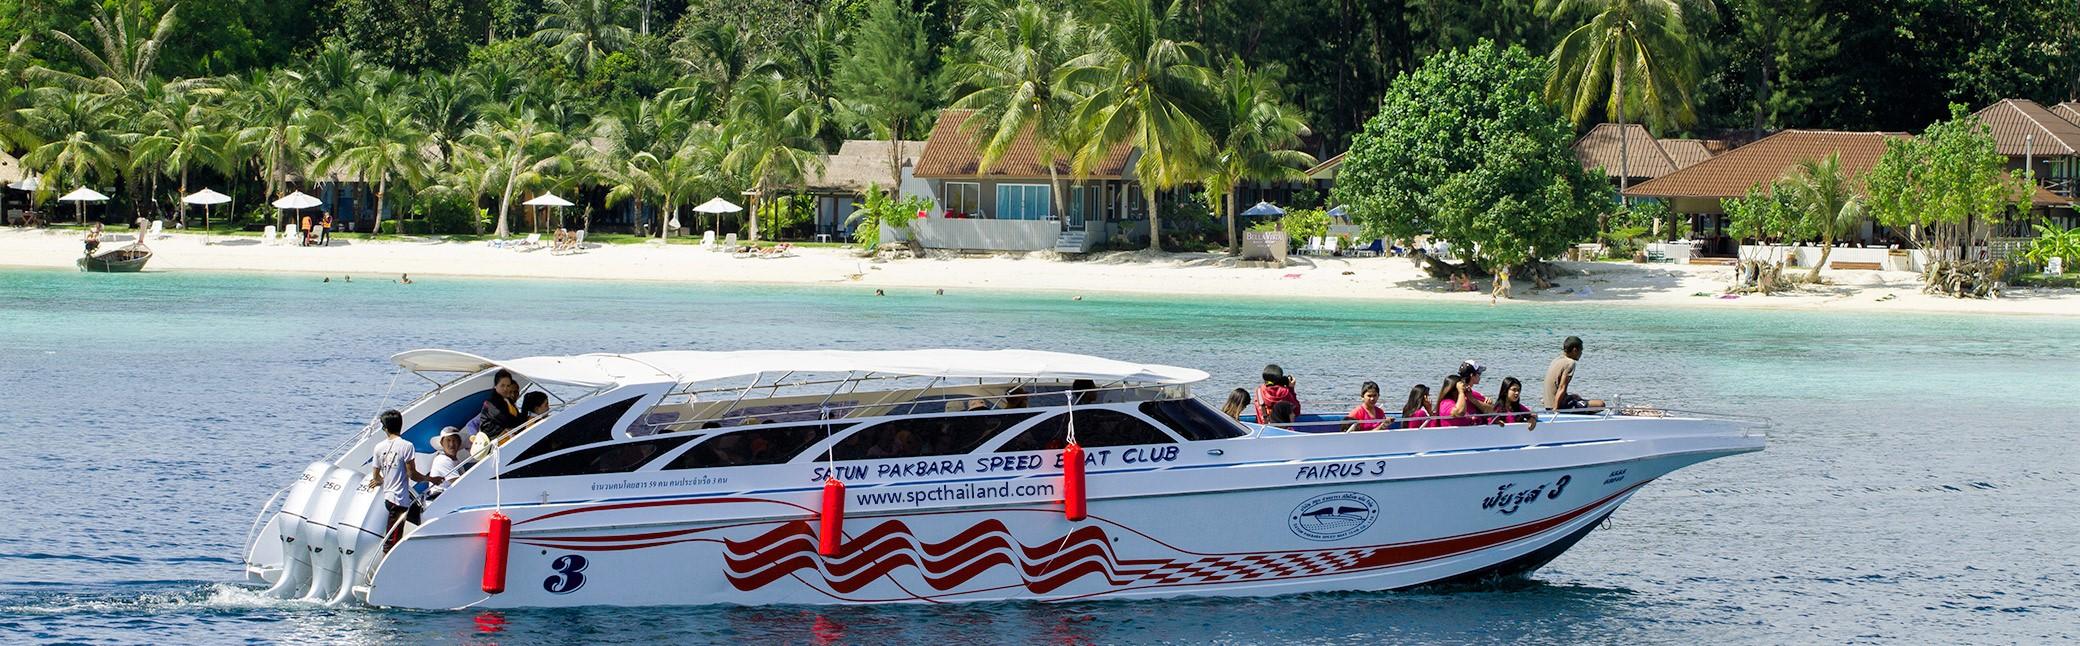 Satun Pakbara SpeedBoat Club cover image